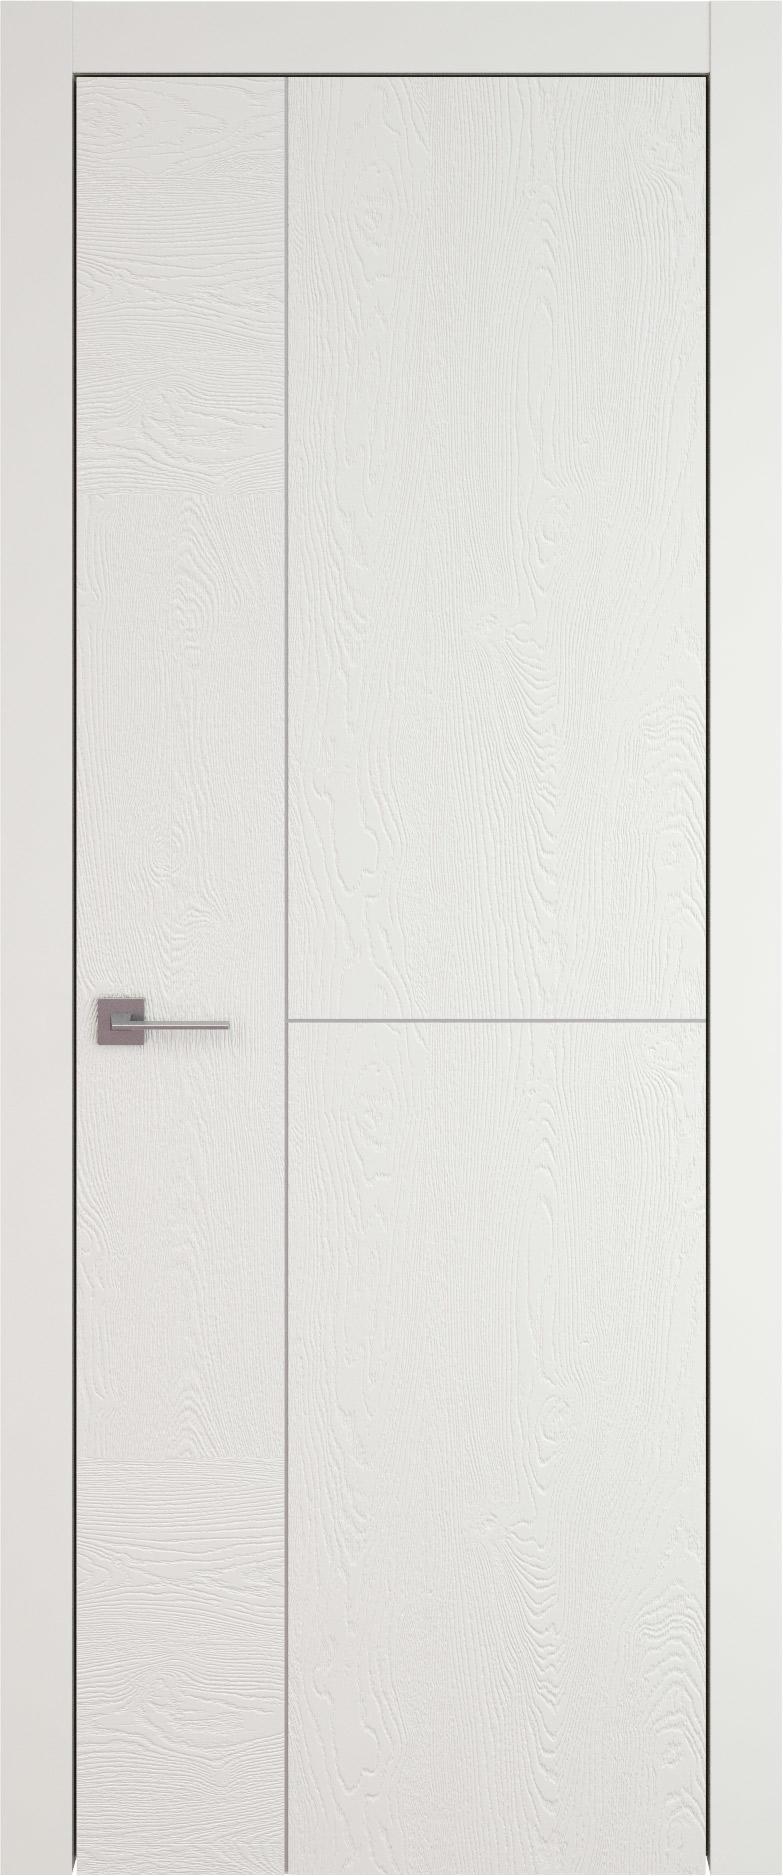 Tivoli Г-1 цвет - Бежевая эмаль по шпону (RAL 9010) Без стекла (ДГ)